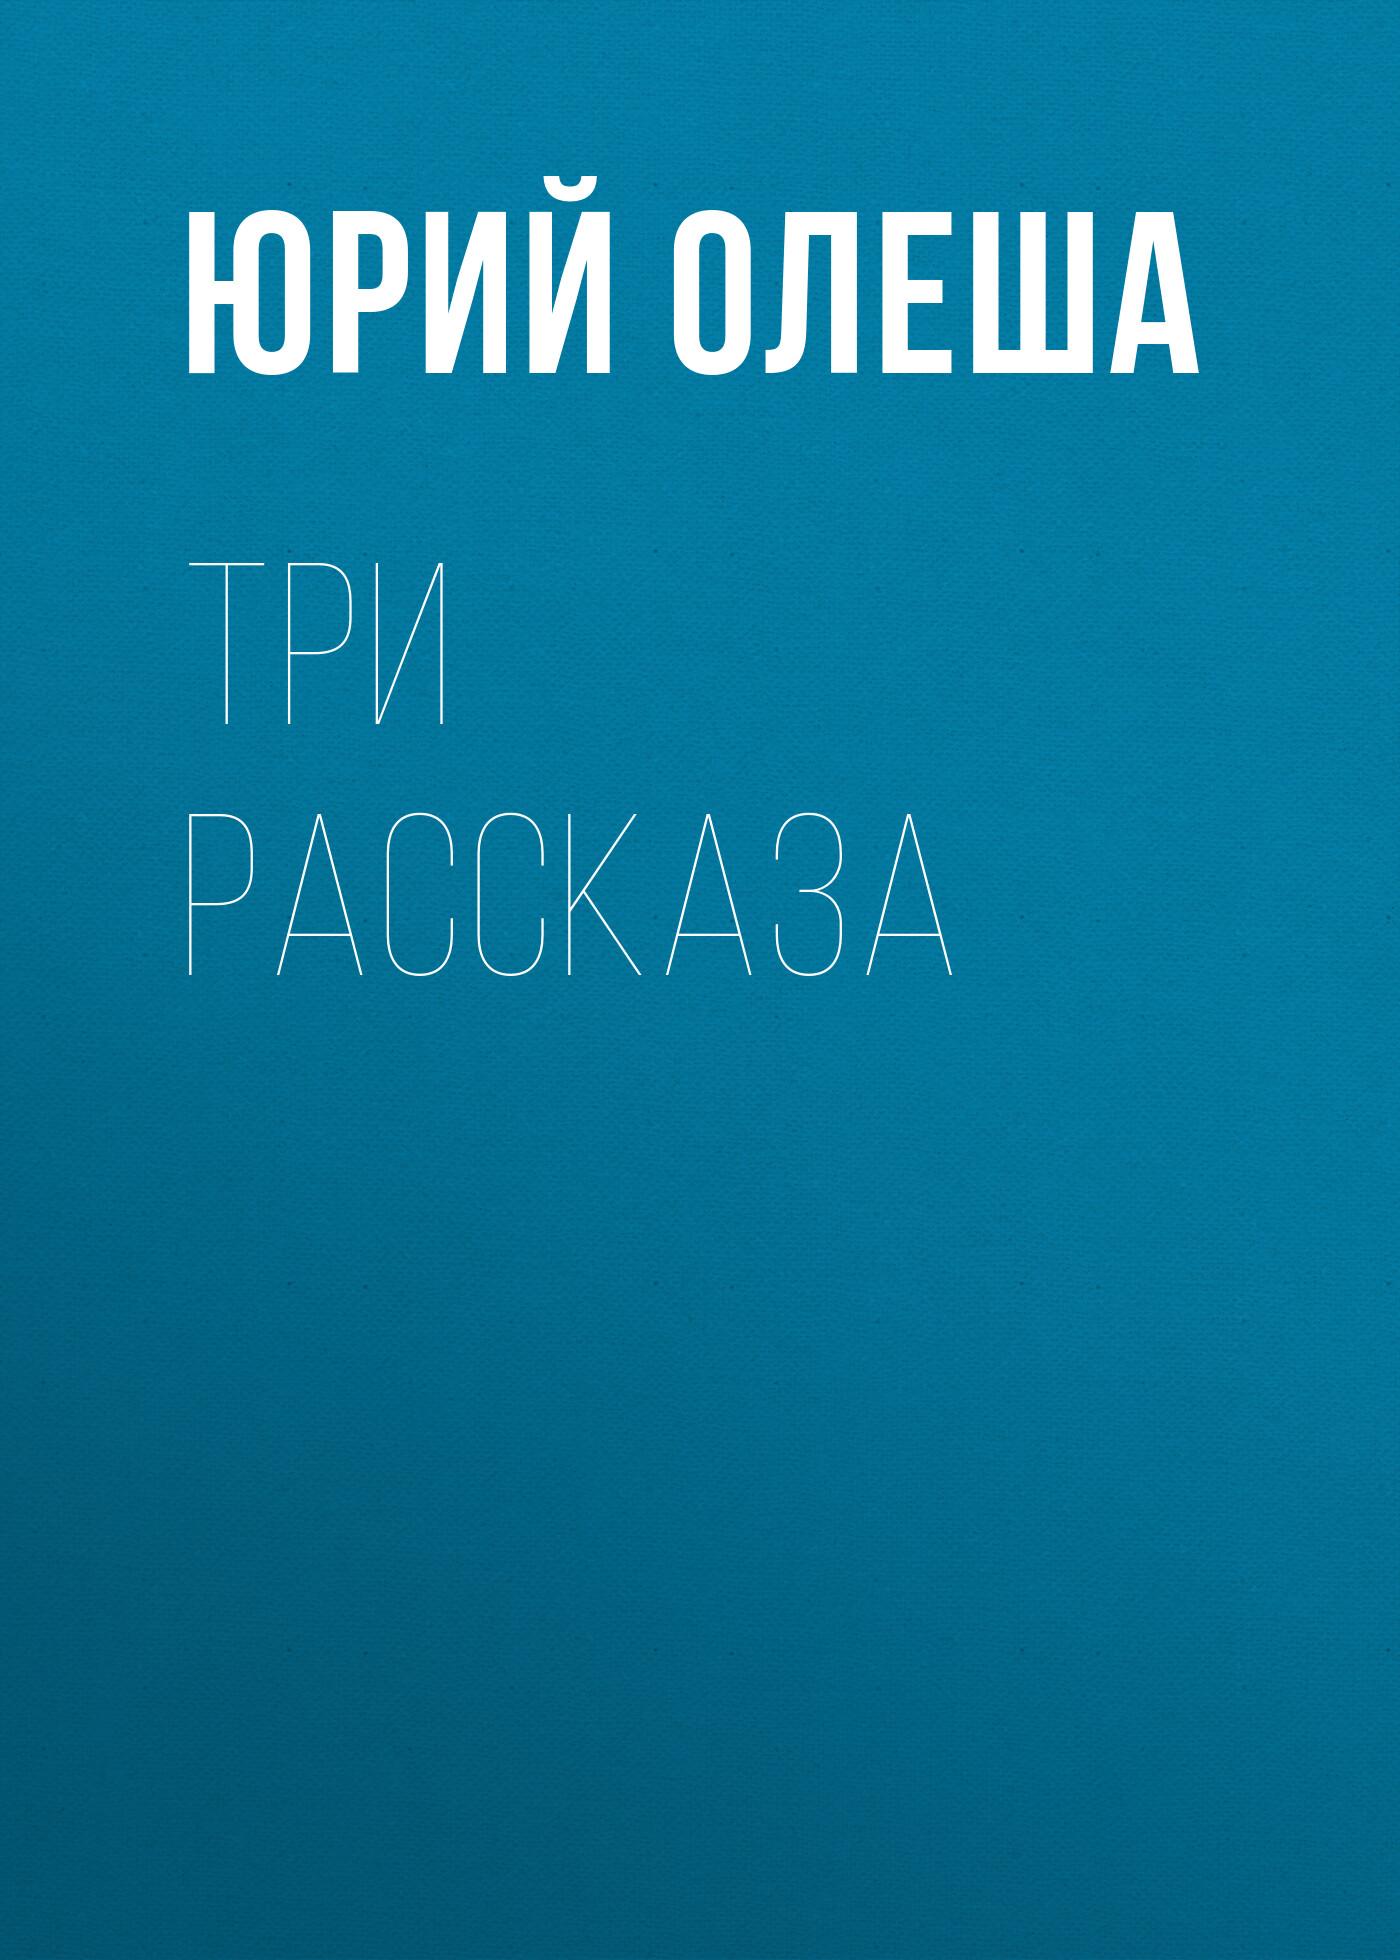 Фото - Юрий Олеша Три рассказа андрэ рье andre rieu dreaming